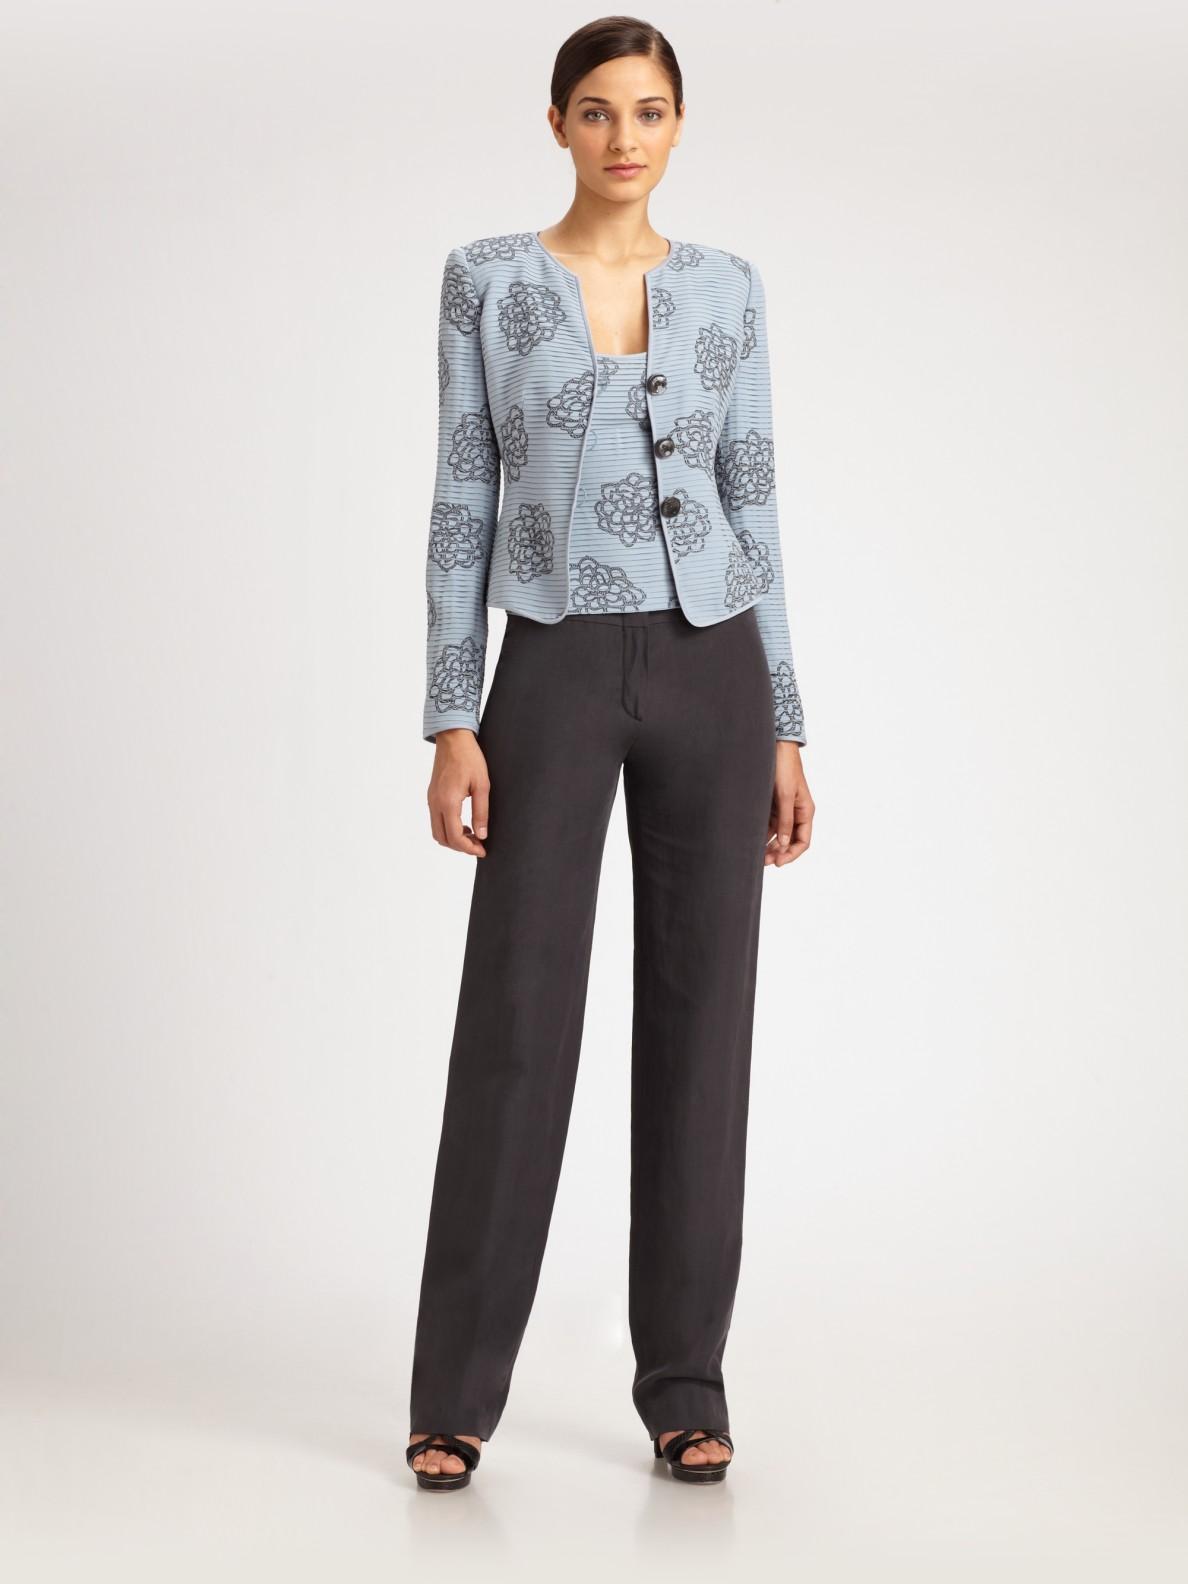 Model Grey Linen Pants Women  Fantastic Blue Grey Linen Pants Women Style U2013 Playzoa.com